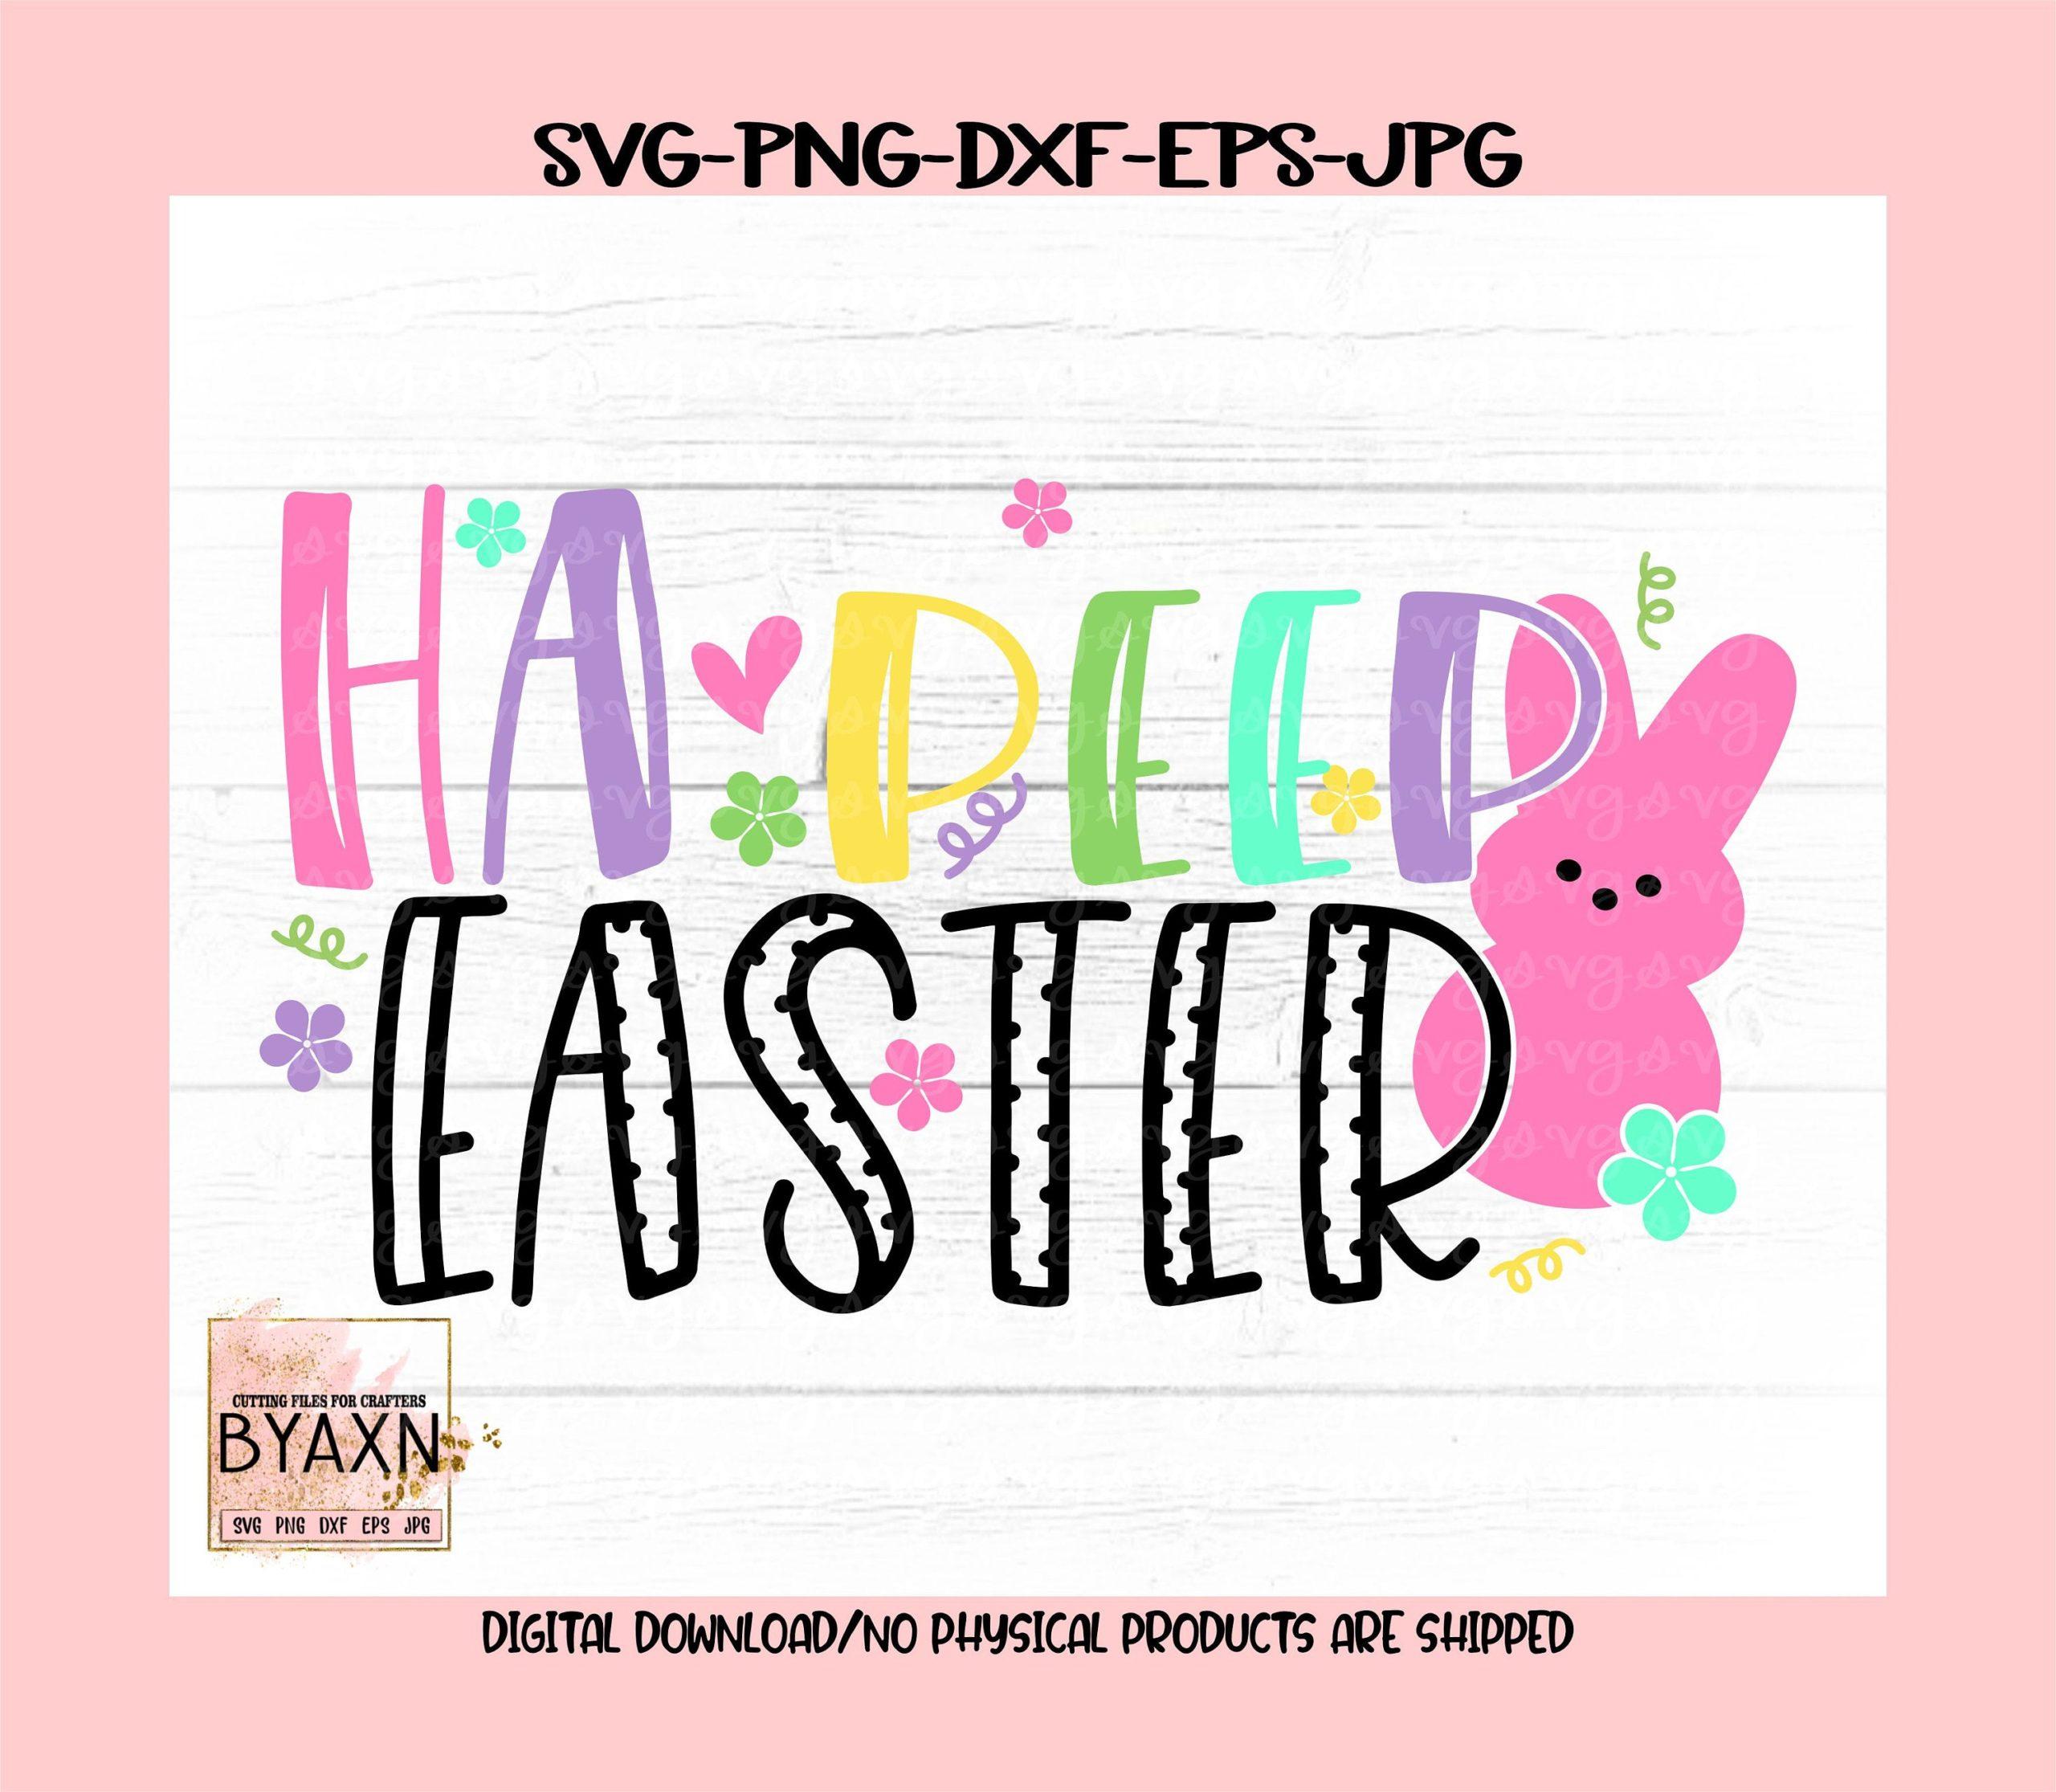 Easter-svg-happy-easter-svg-marshmallow-svg-jesus-svg-easter-svg-easter-svg-design-easter-cut-file-easter-cricut-svgcricut-svg-6051497d